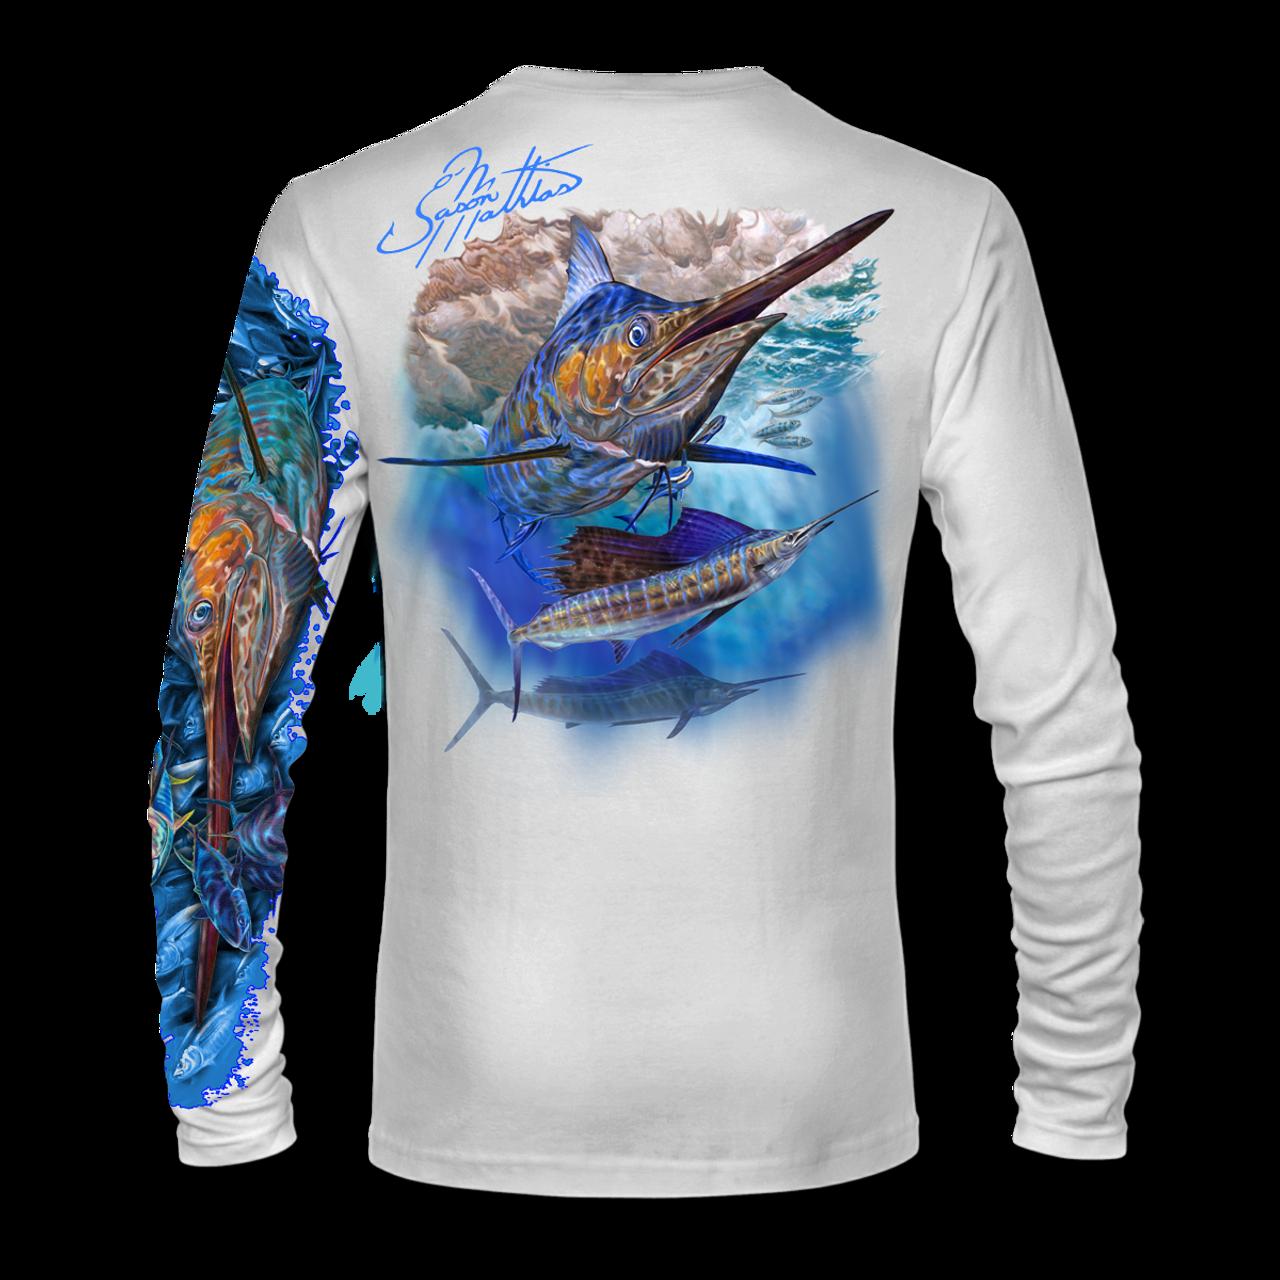 Jason Mathias Blue Marlin Sailfish LS High Performance Long Sleeve T-Shirt